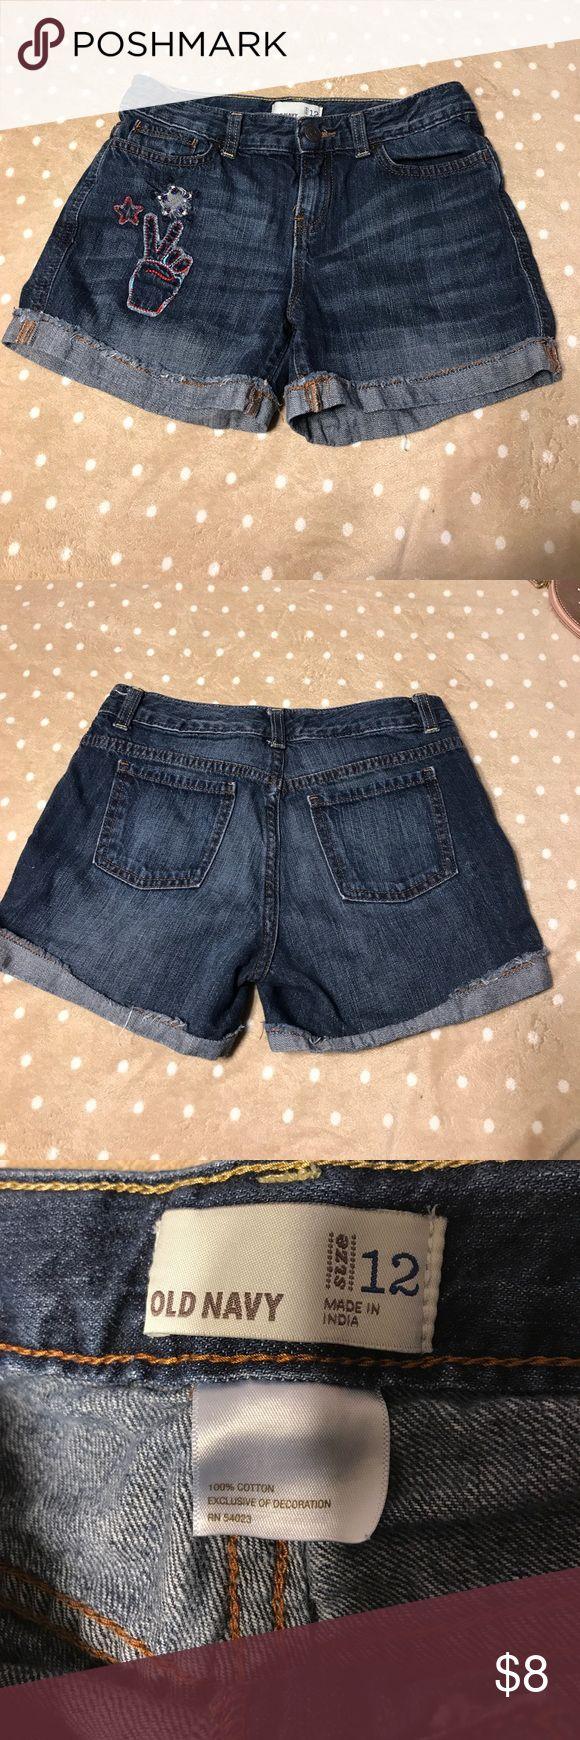 OLD NAVY SHORTS (peace sign) Girls old navy shorts. Old Navy Bottoms Shorts